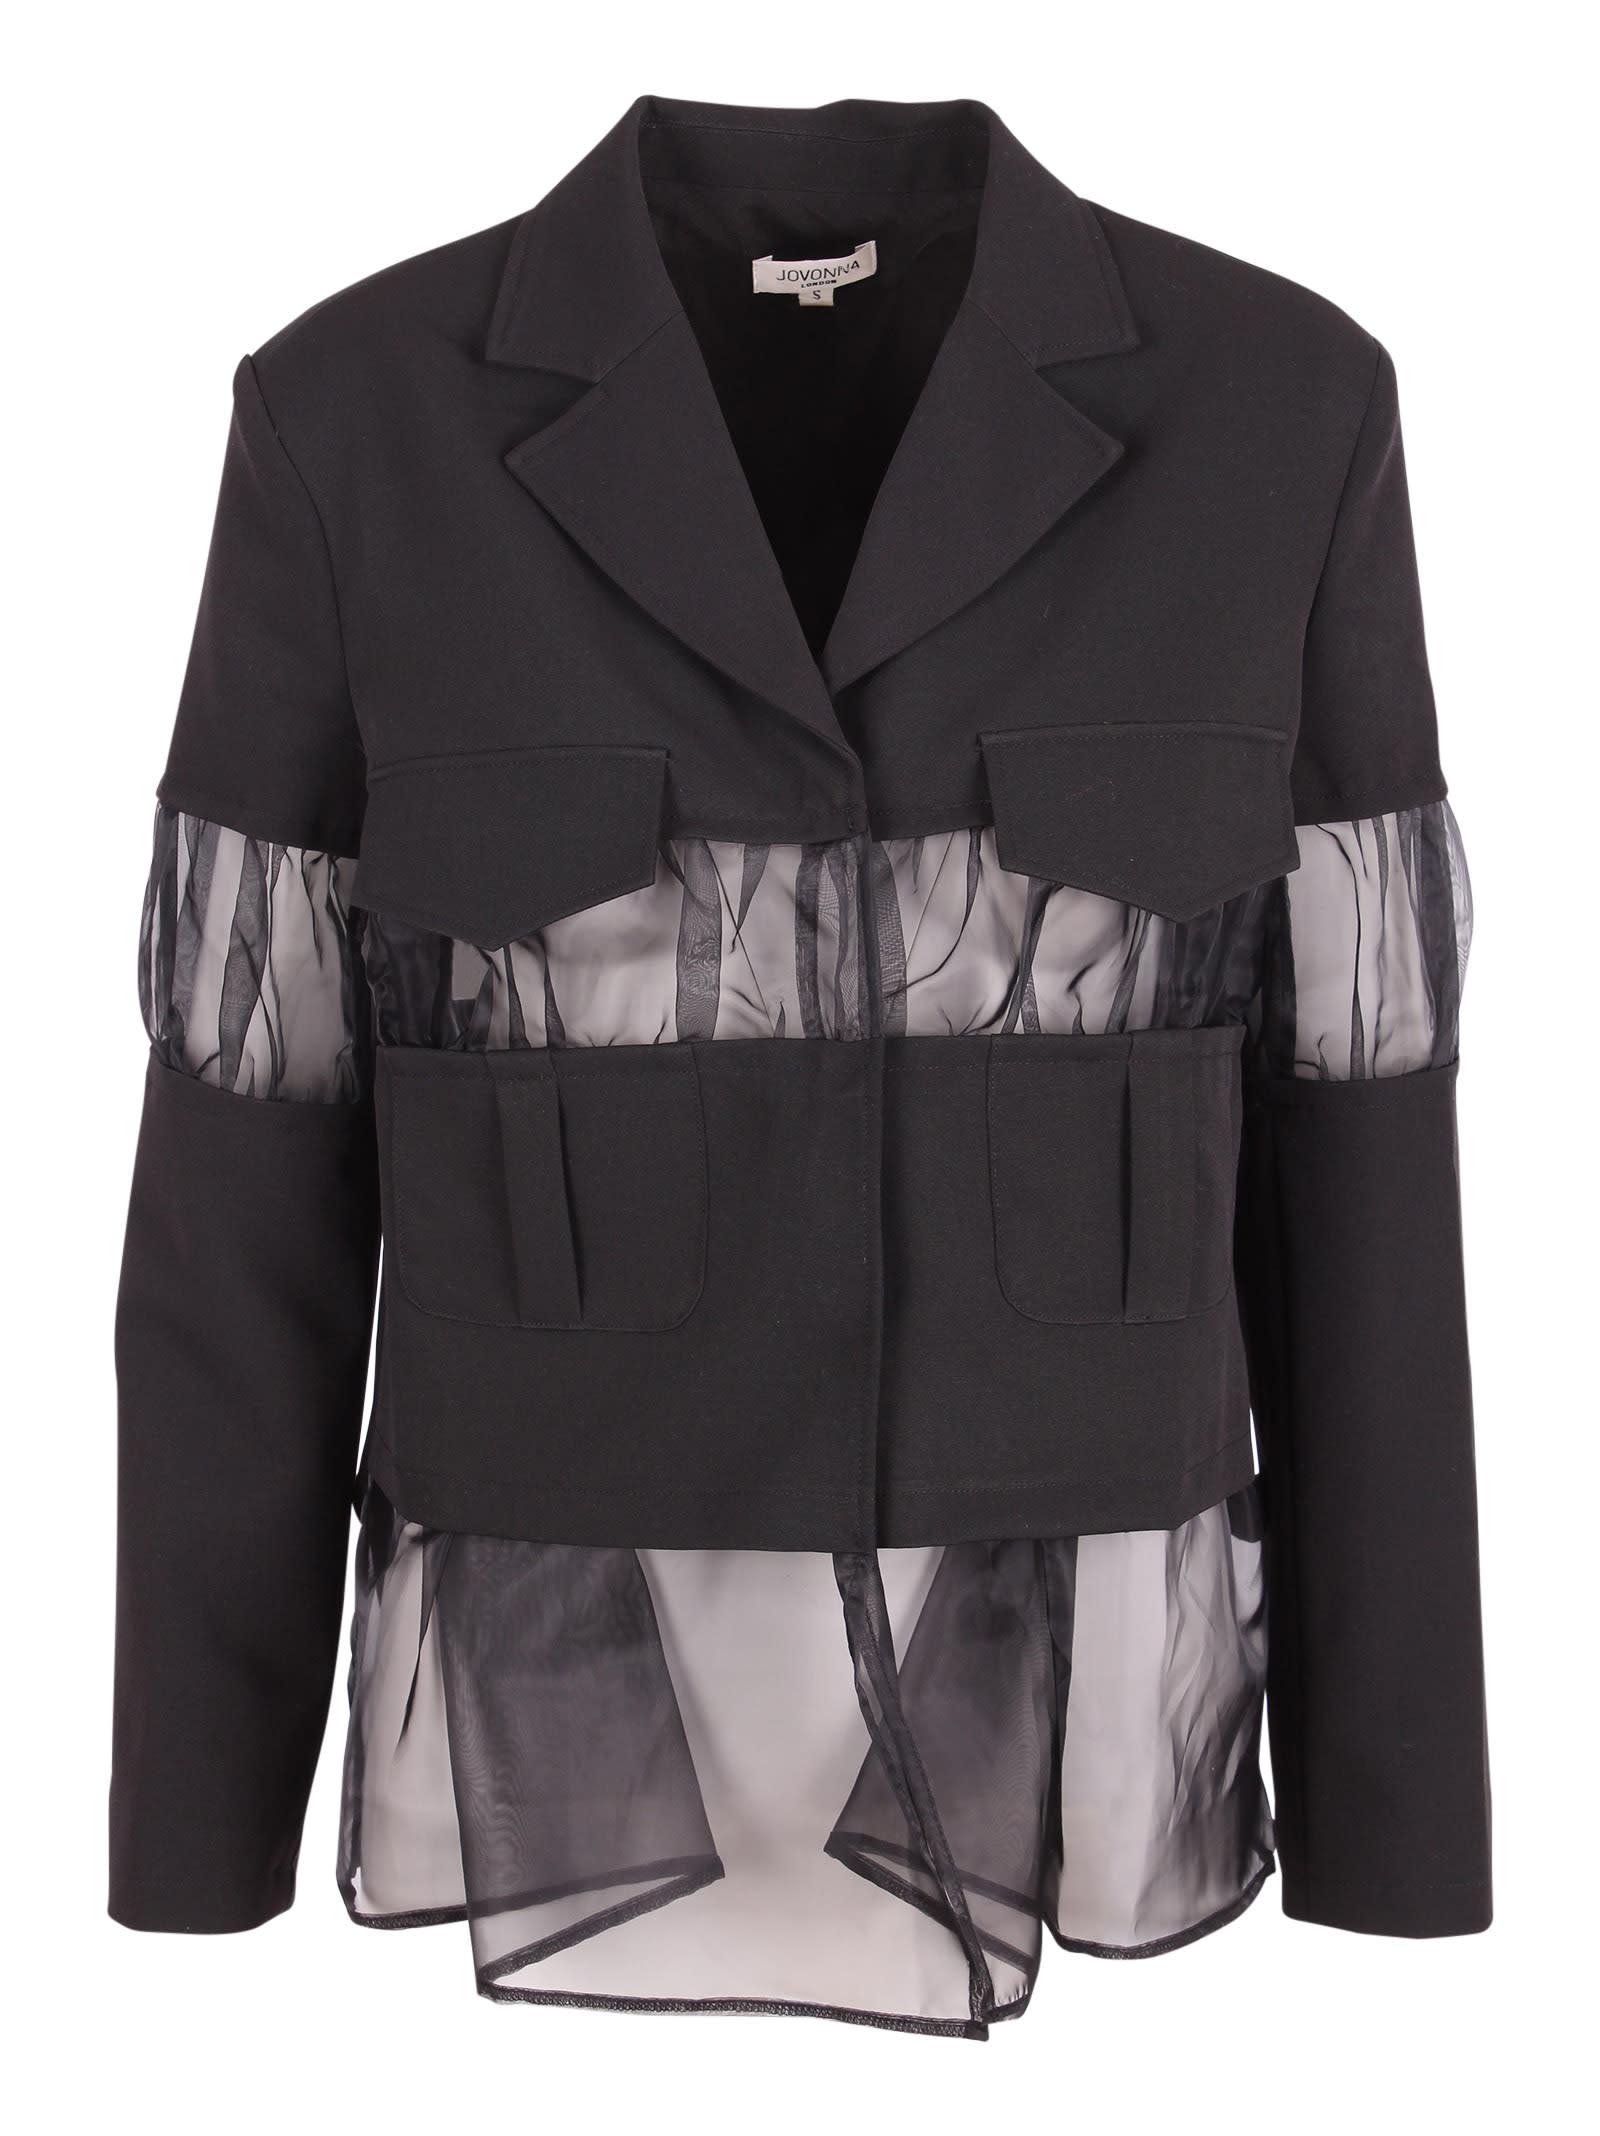 London rainey Polyester Blazer